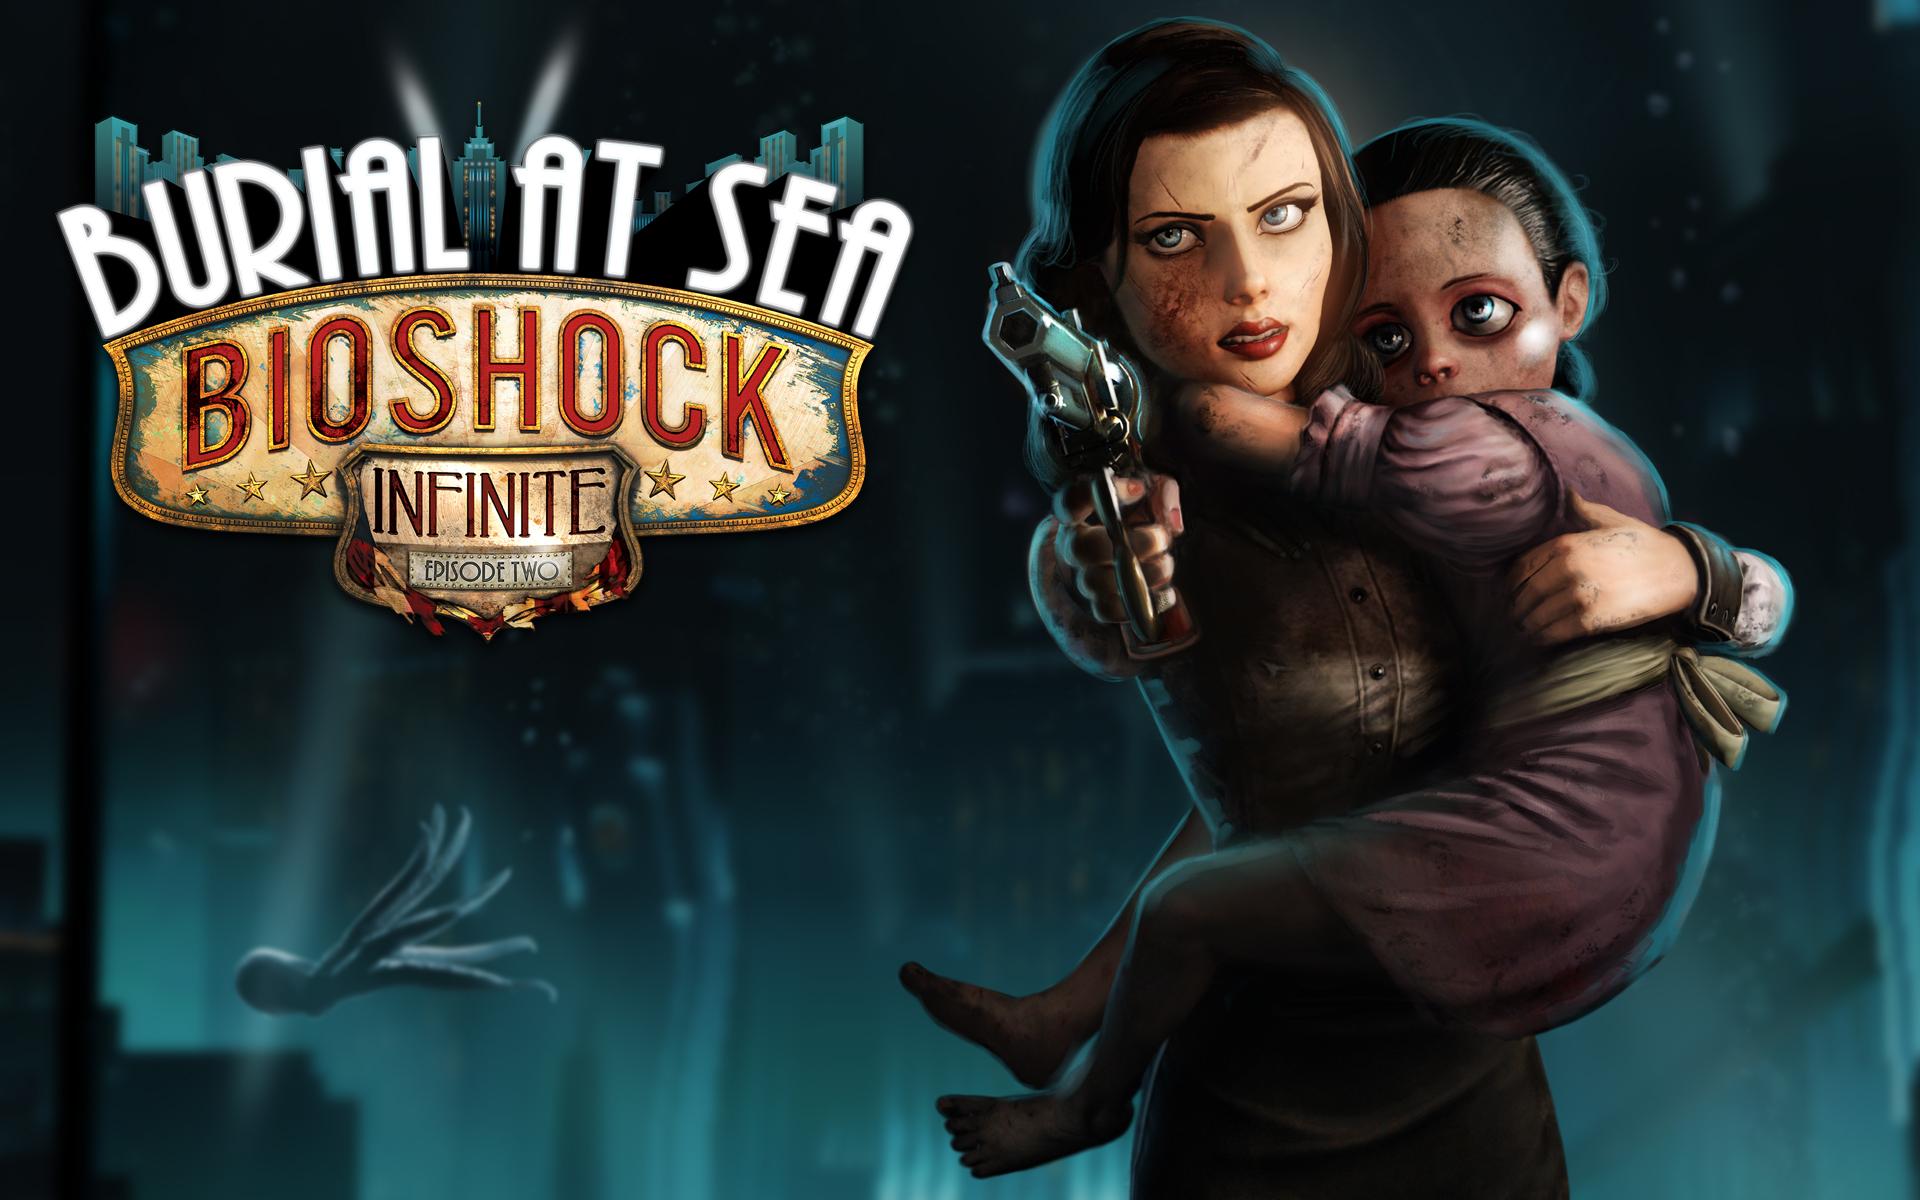 Арт к игре BioShock Infinite: Burial at Sea - Episode Two